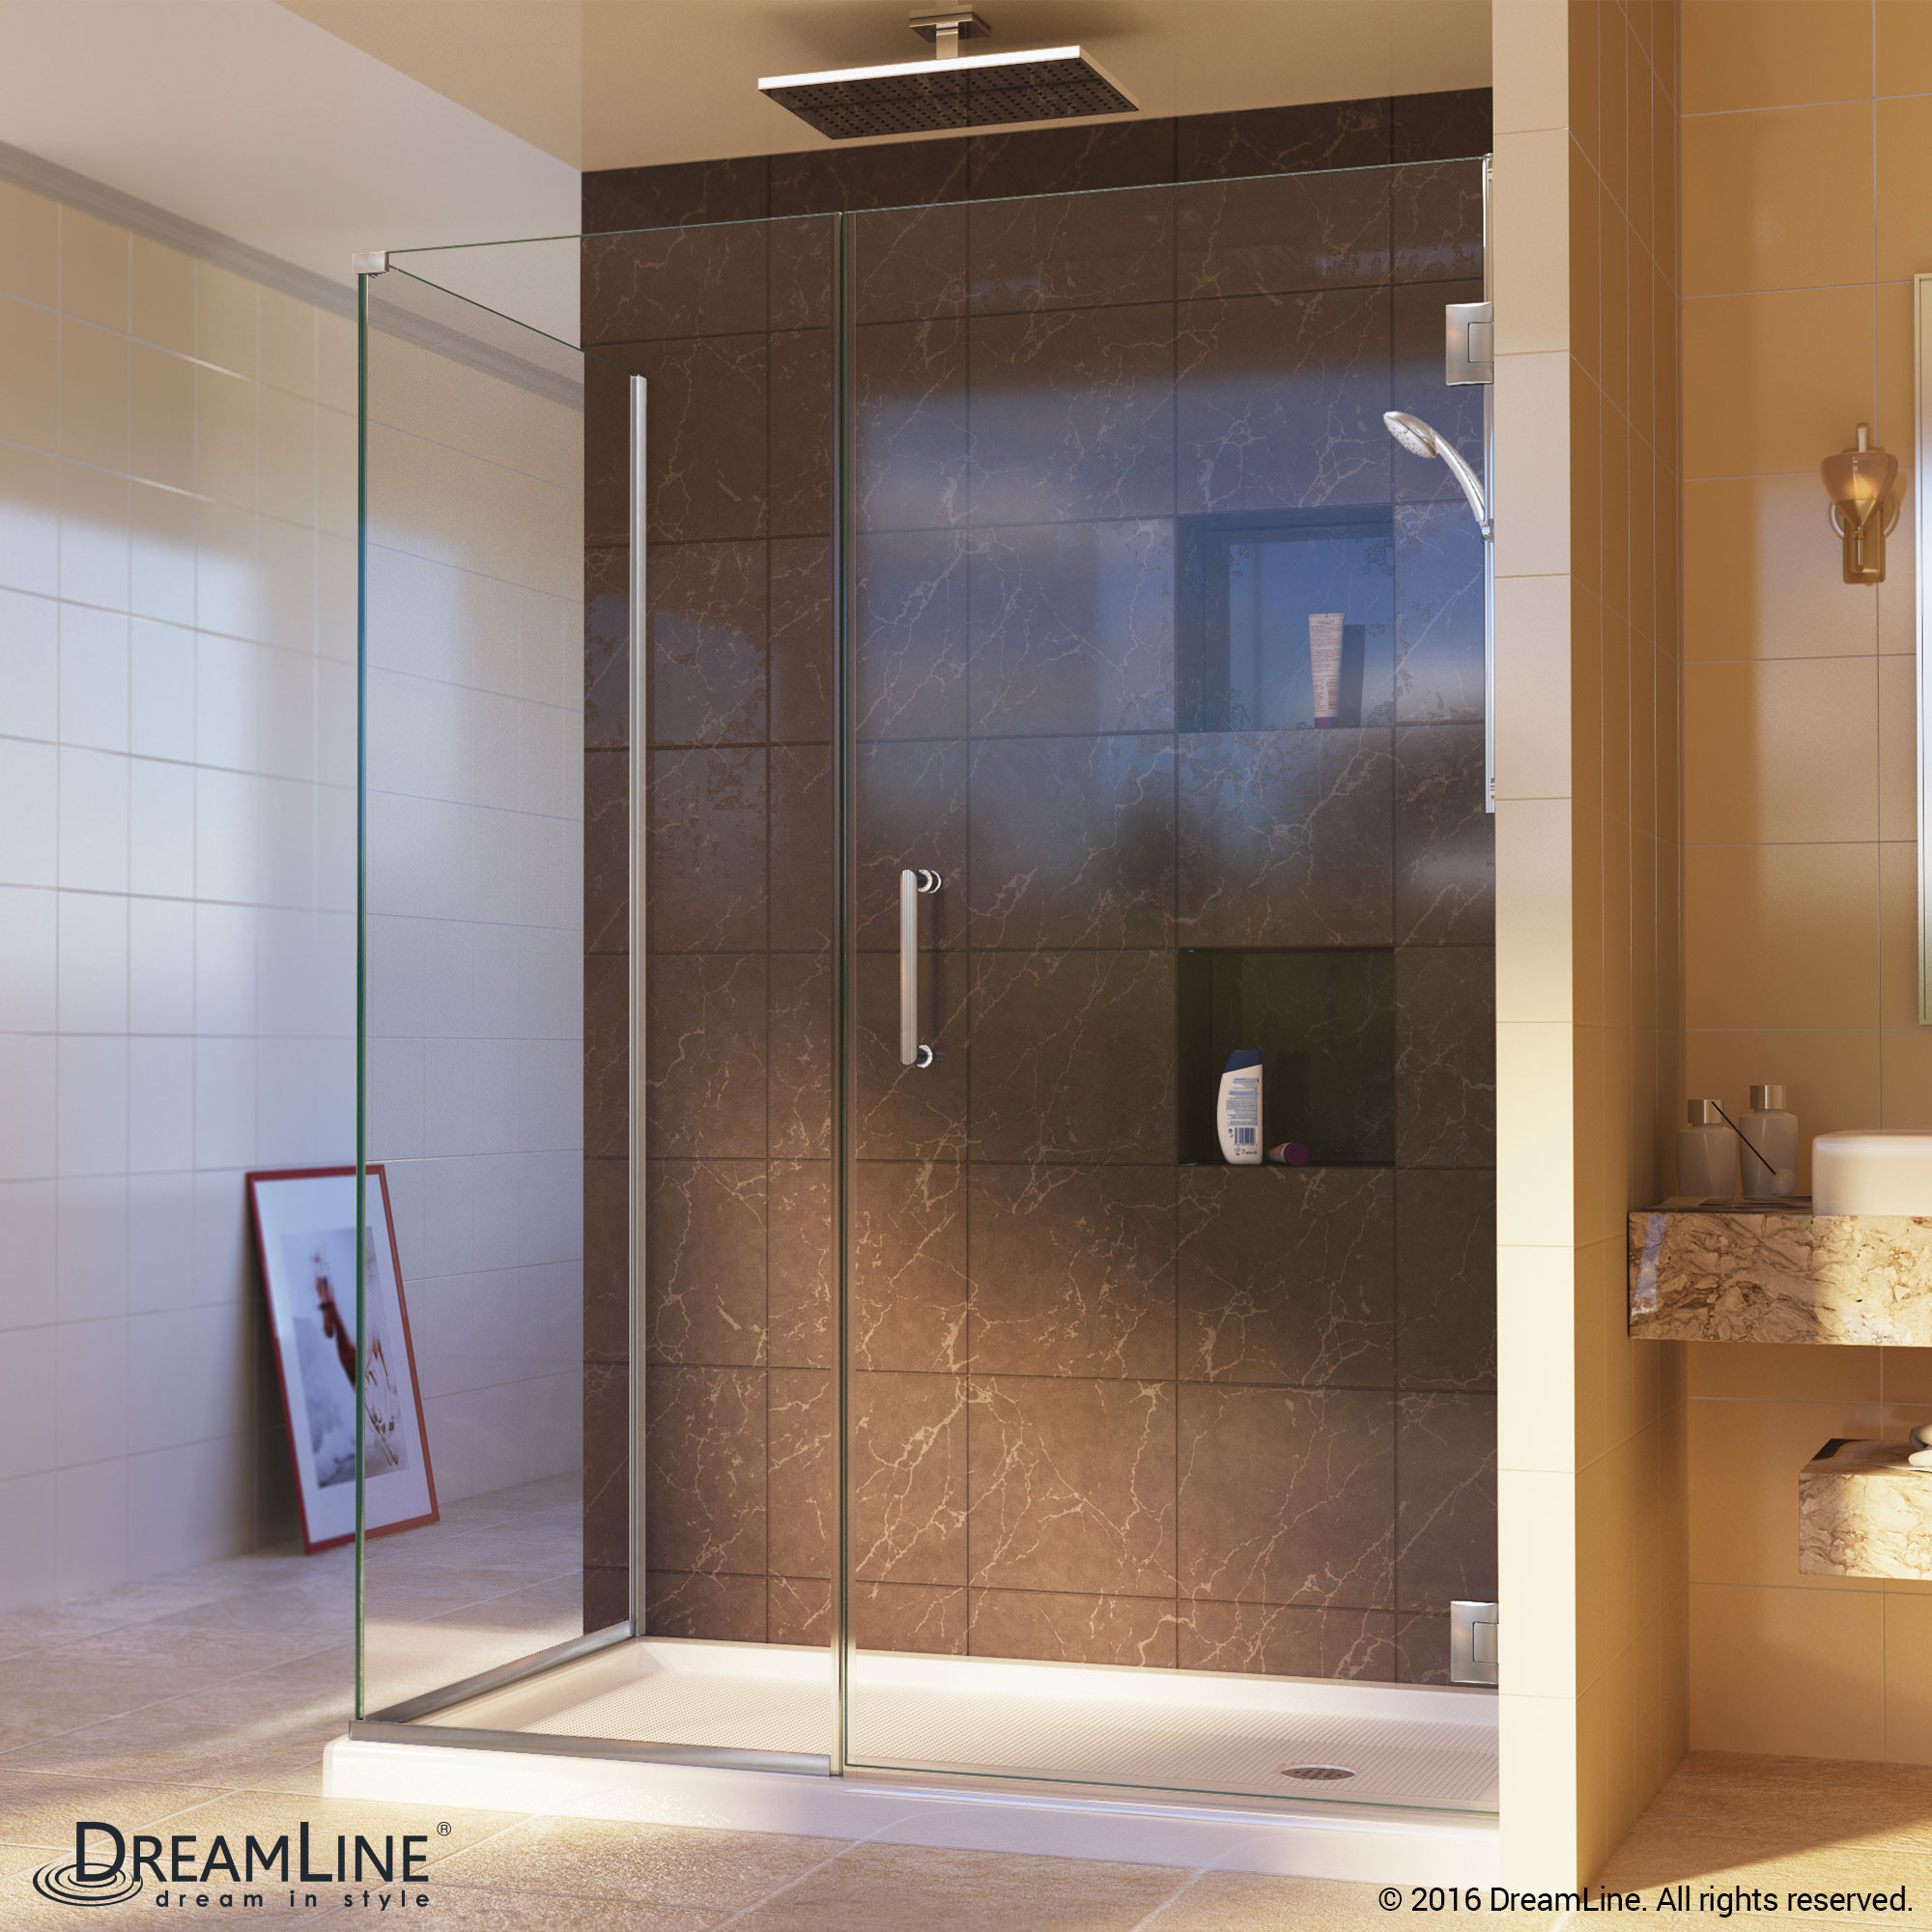 DreamLine SHEN-24520340-04 Unidoor Plus Hinged Shower Enclosure, Brushed Nickel Finish Hardware